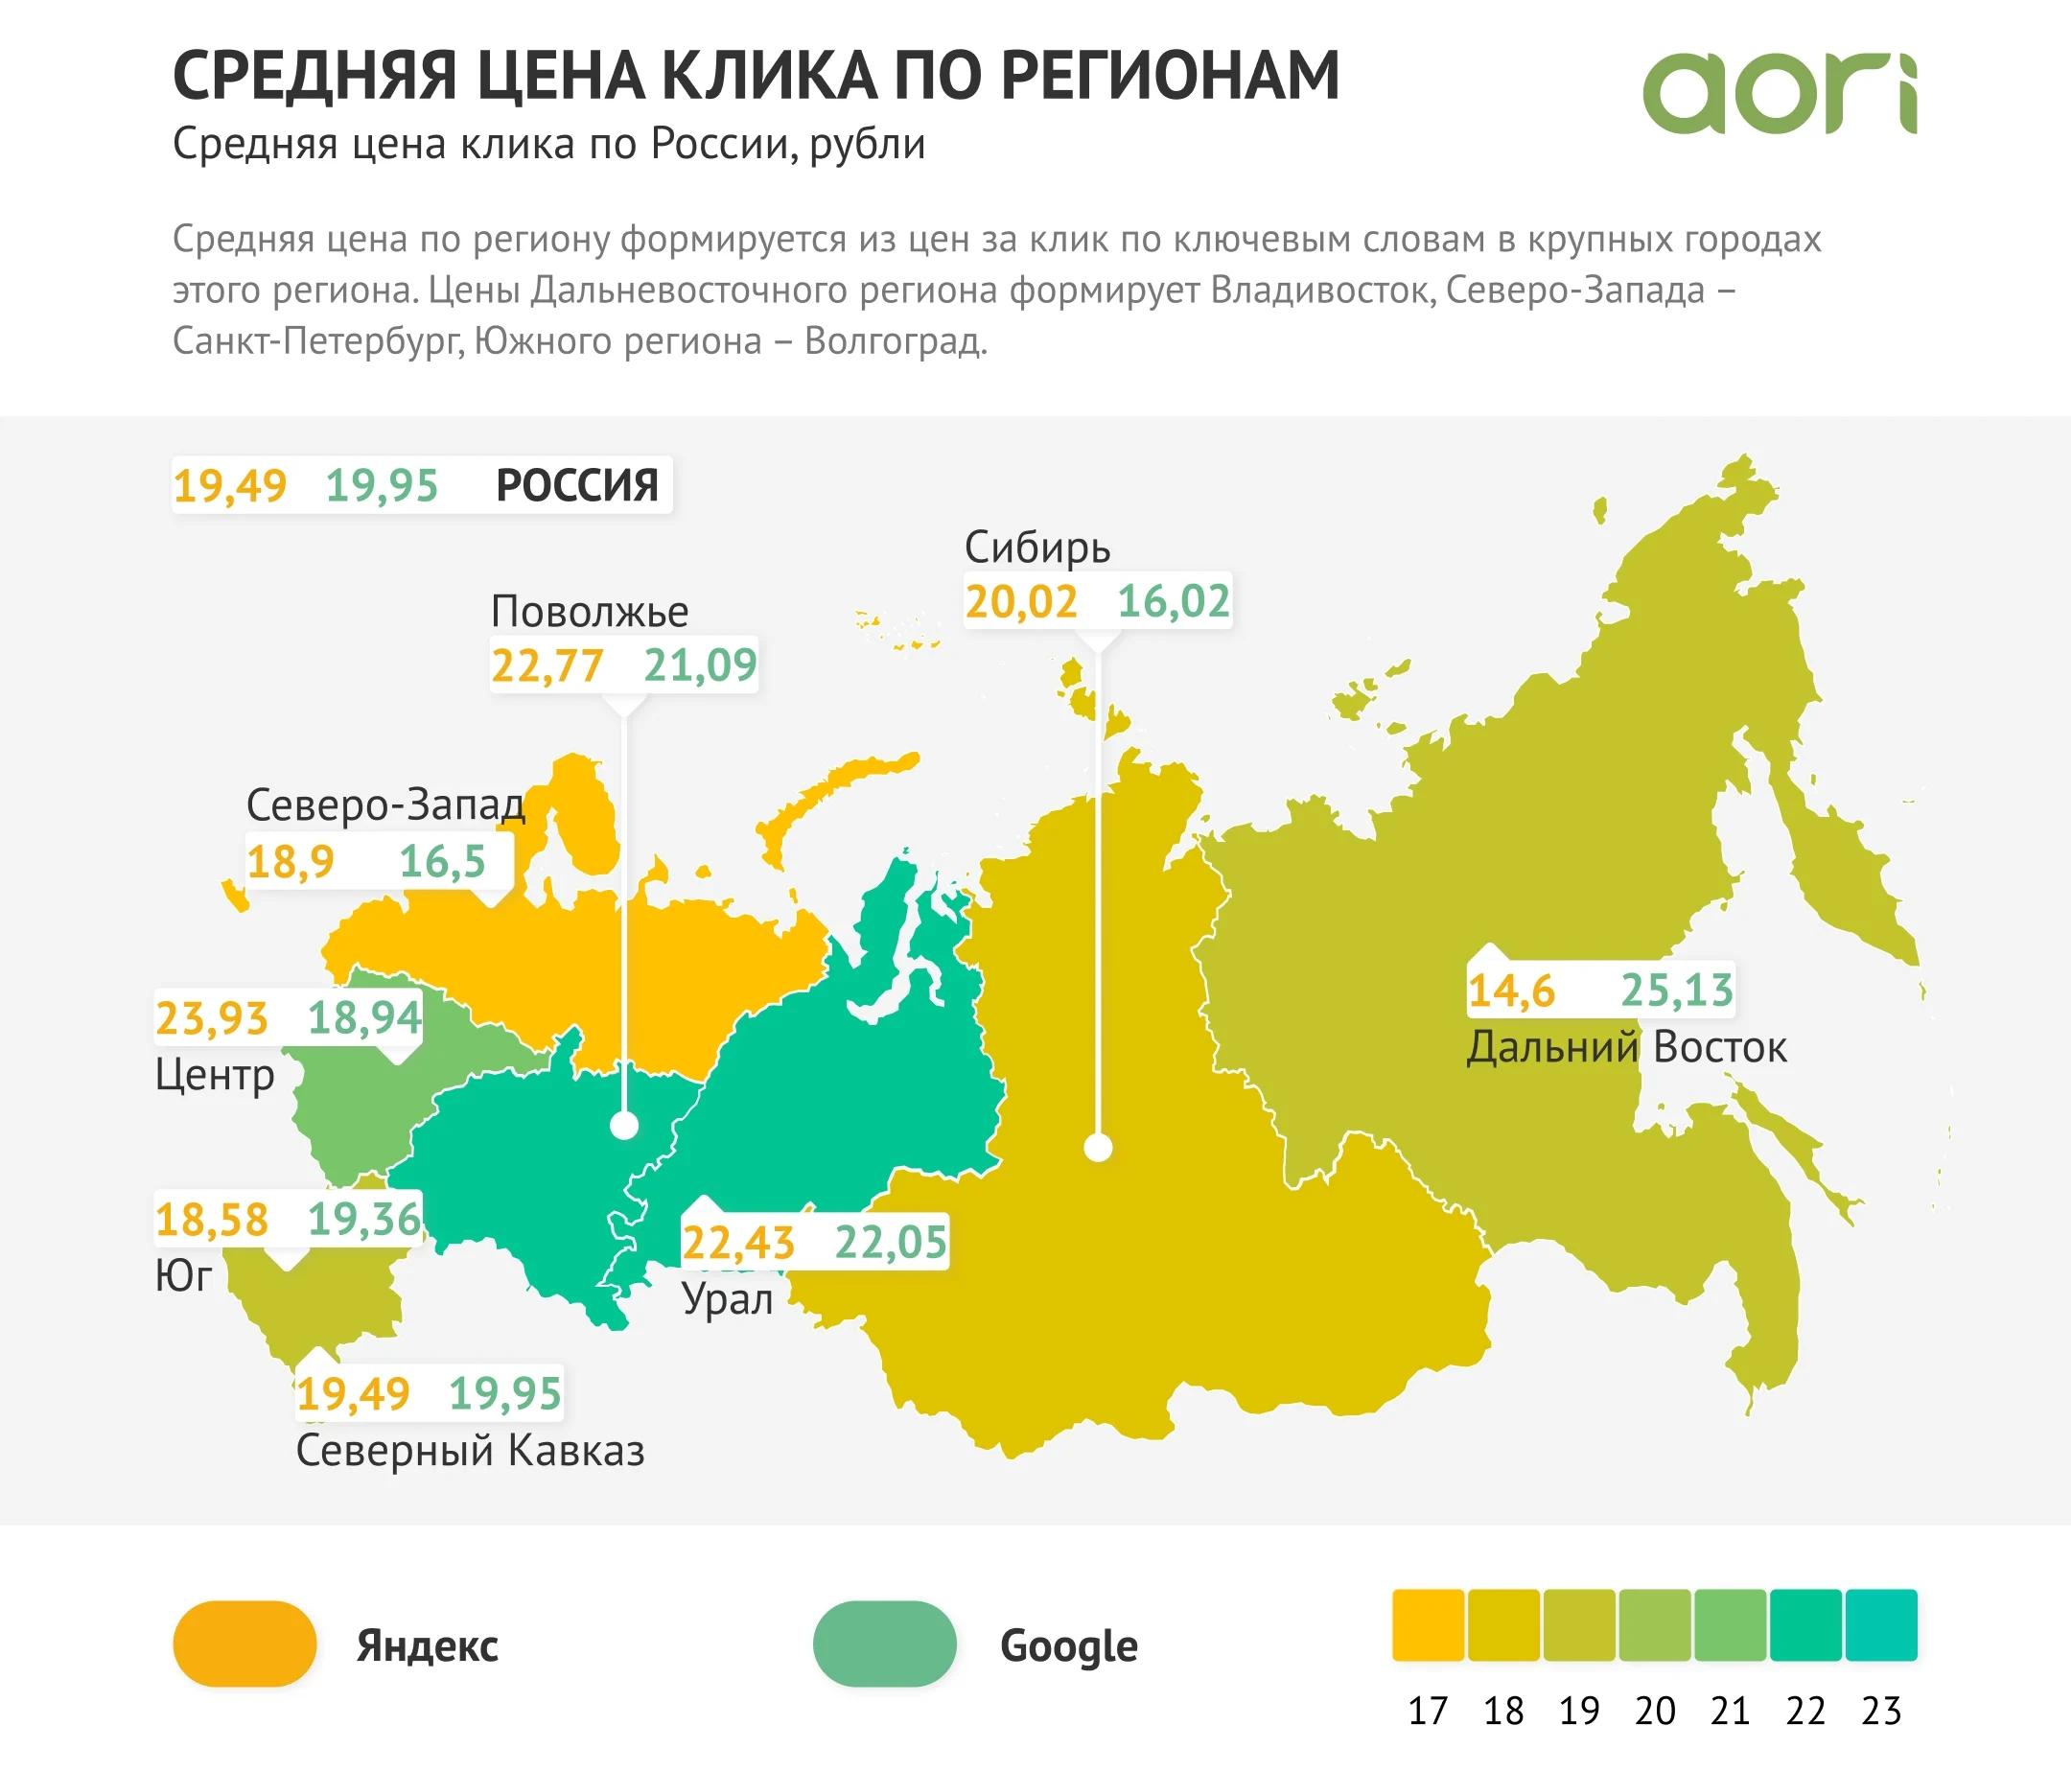 Средняя цена клика по регионам в 2020